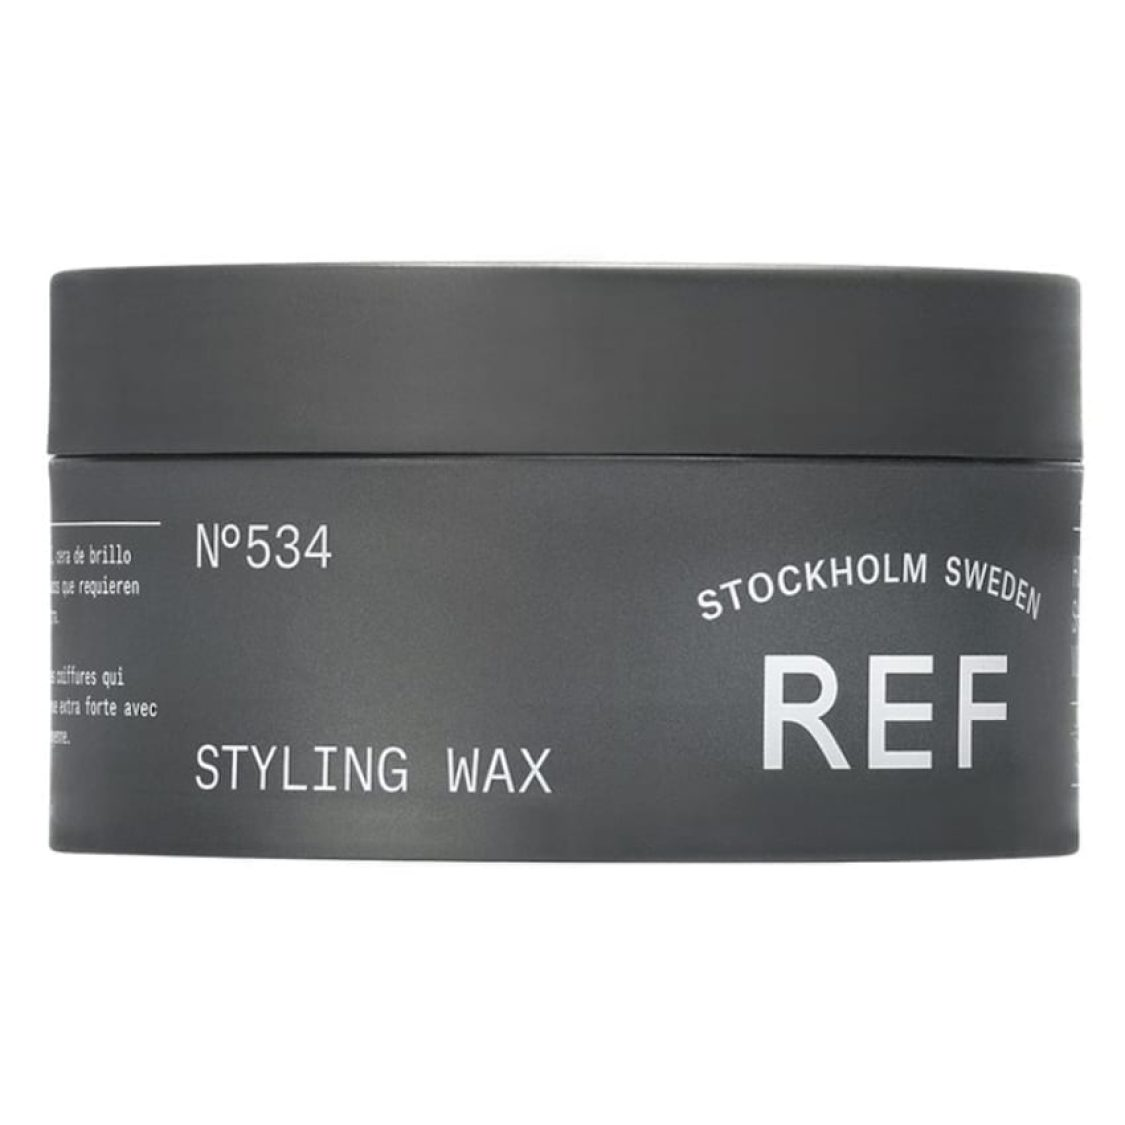 REF - Styling Wax 85ml